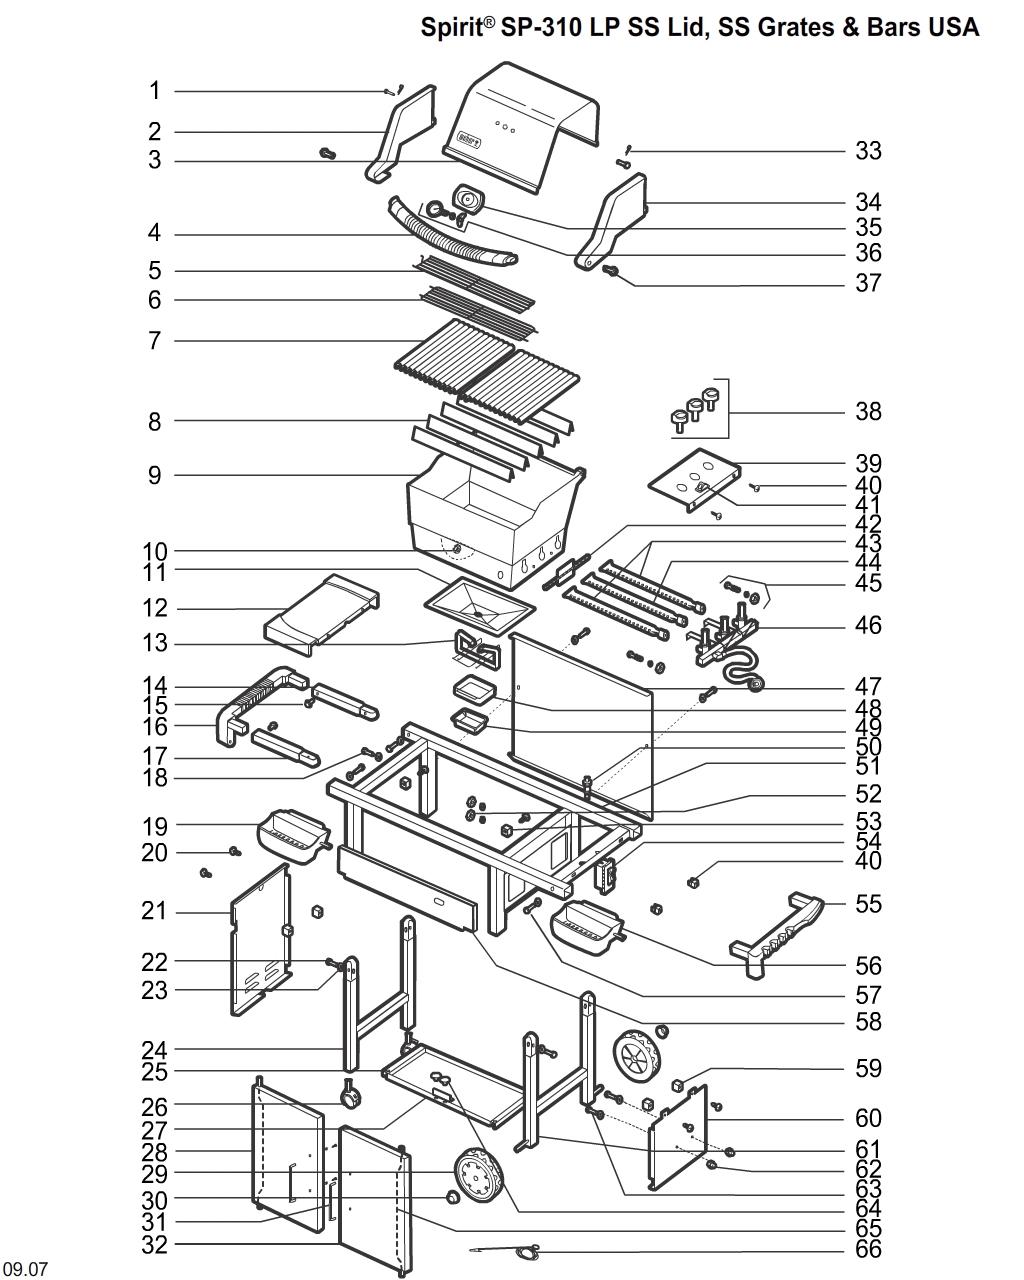 Schematic Image 3720301